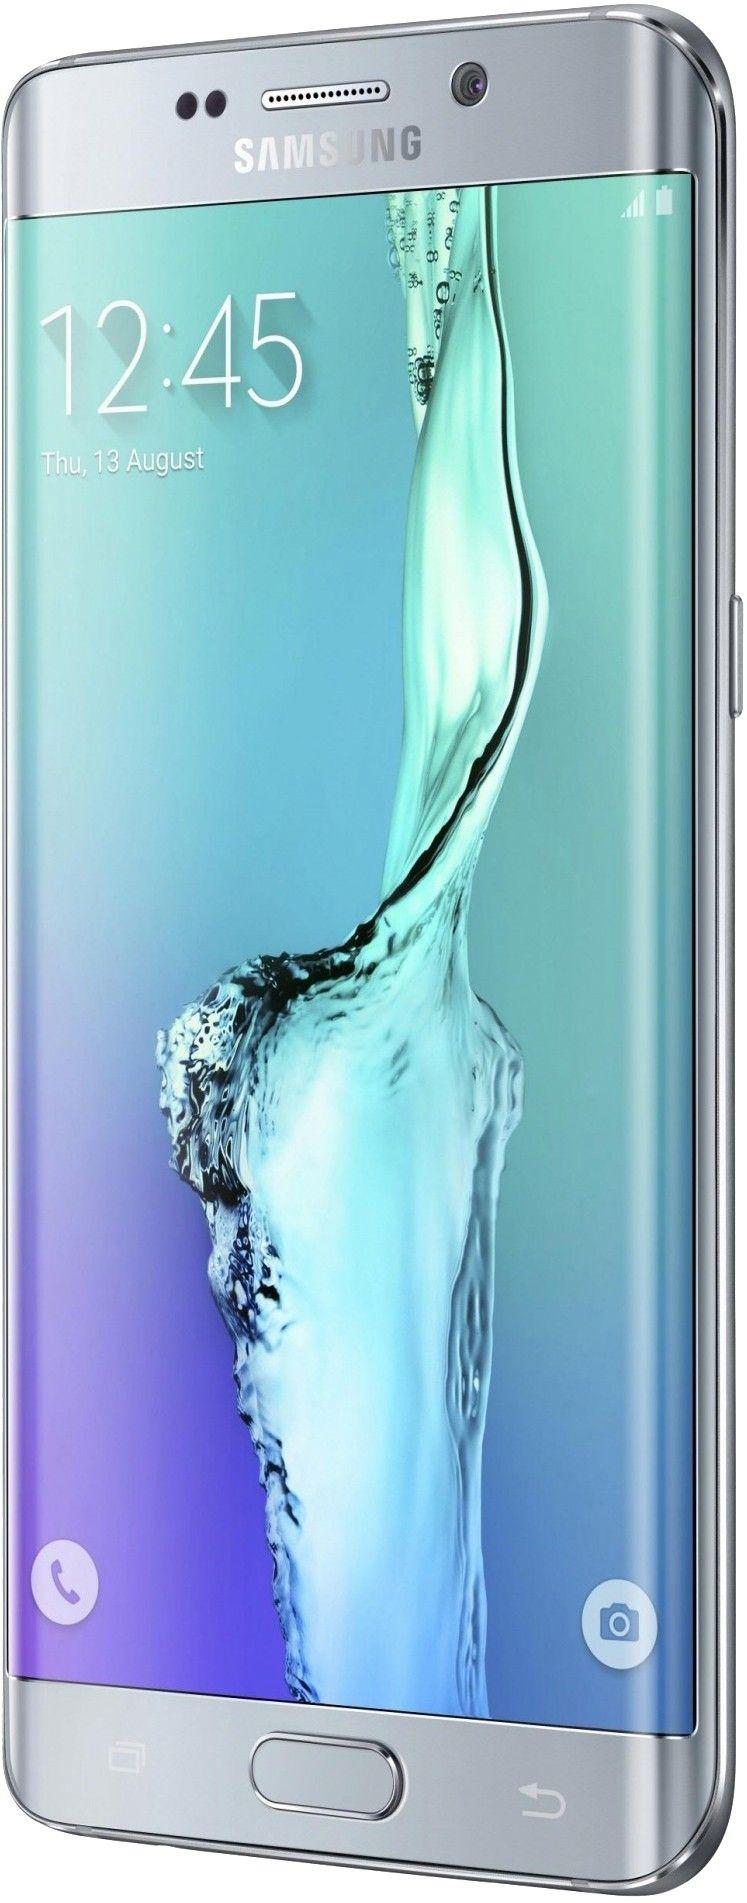 Мобильный телефон Samsung Galaxy S6 Edge+ 64GB G928 Silver - 3